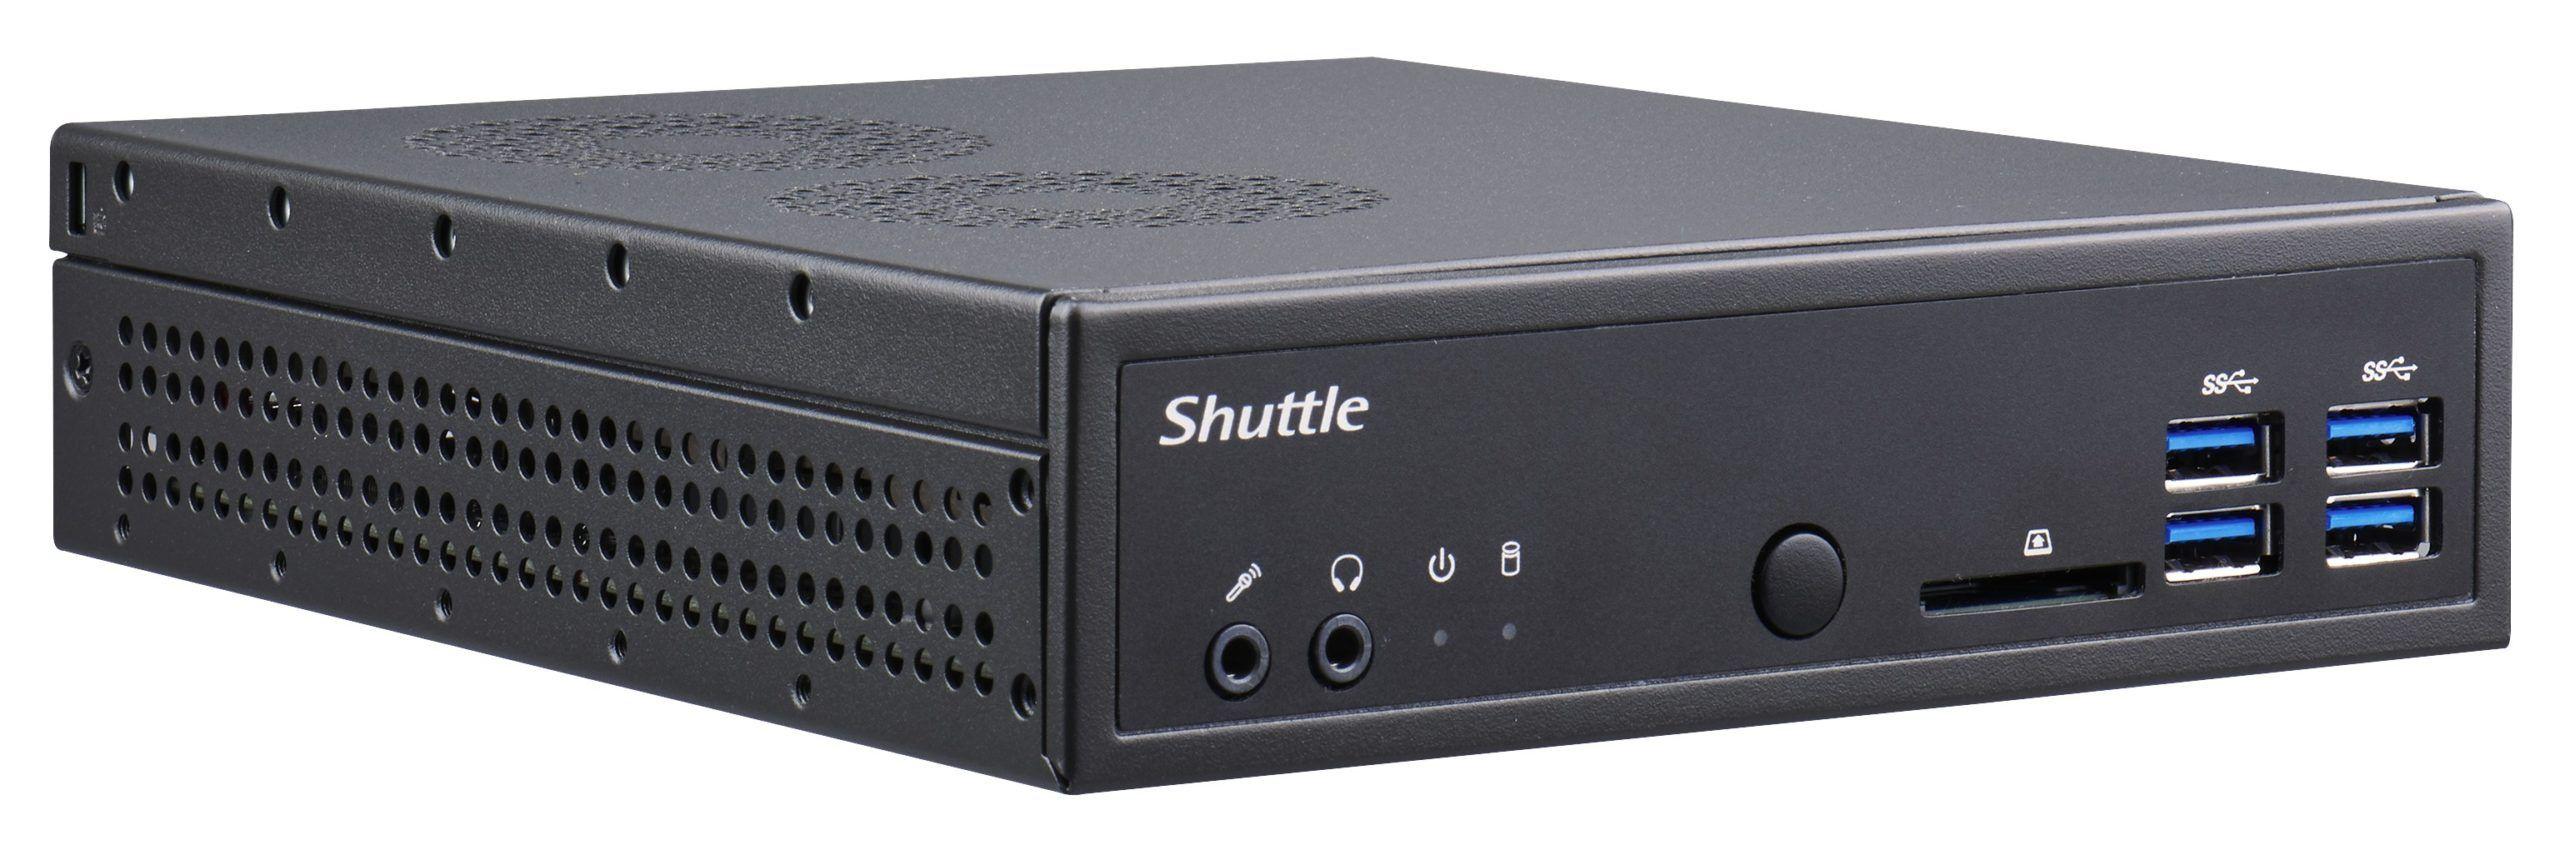 PC compacto Shuttle Ryzer